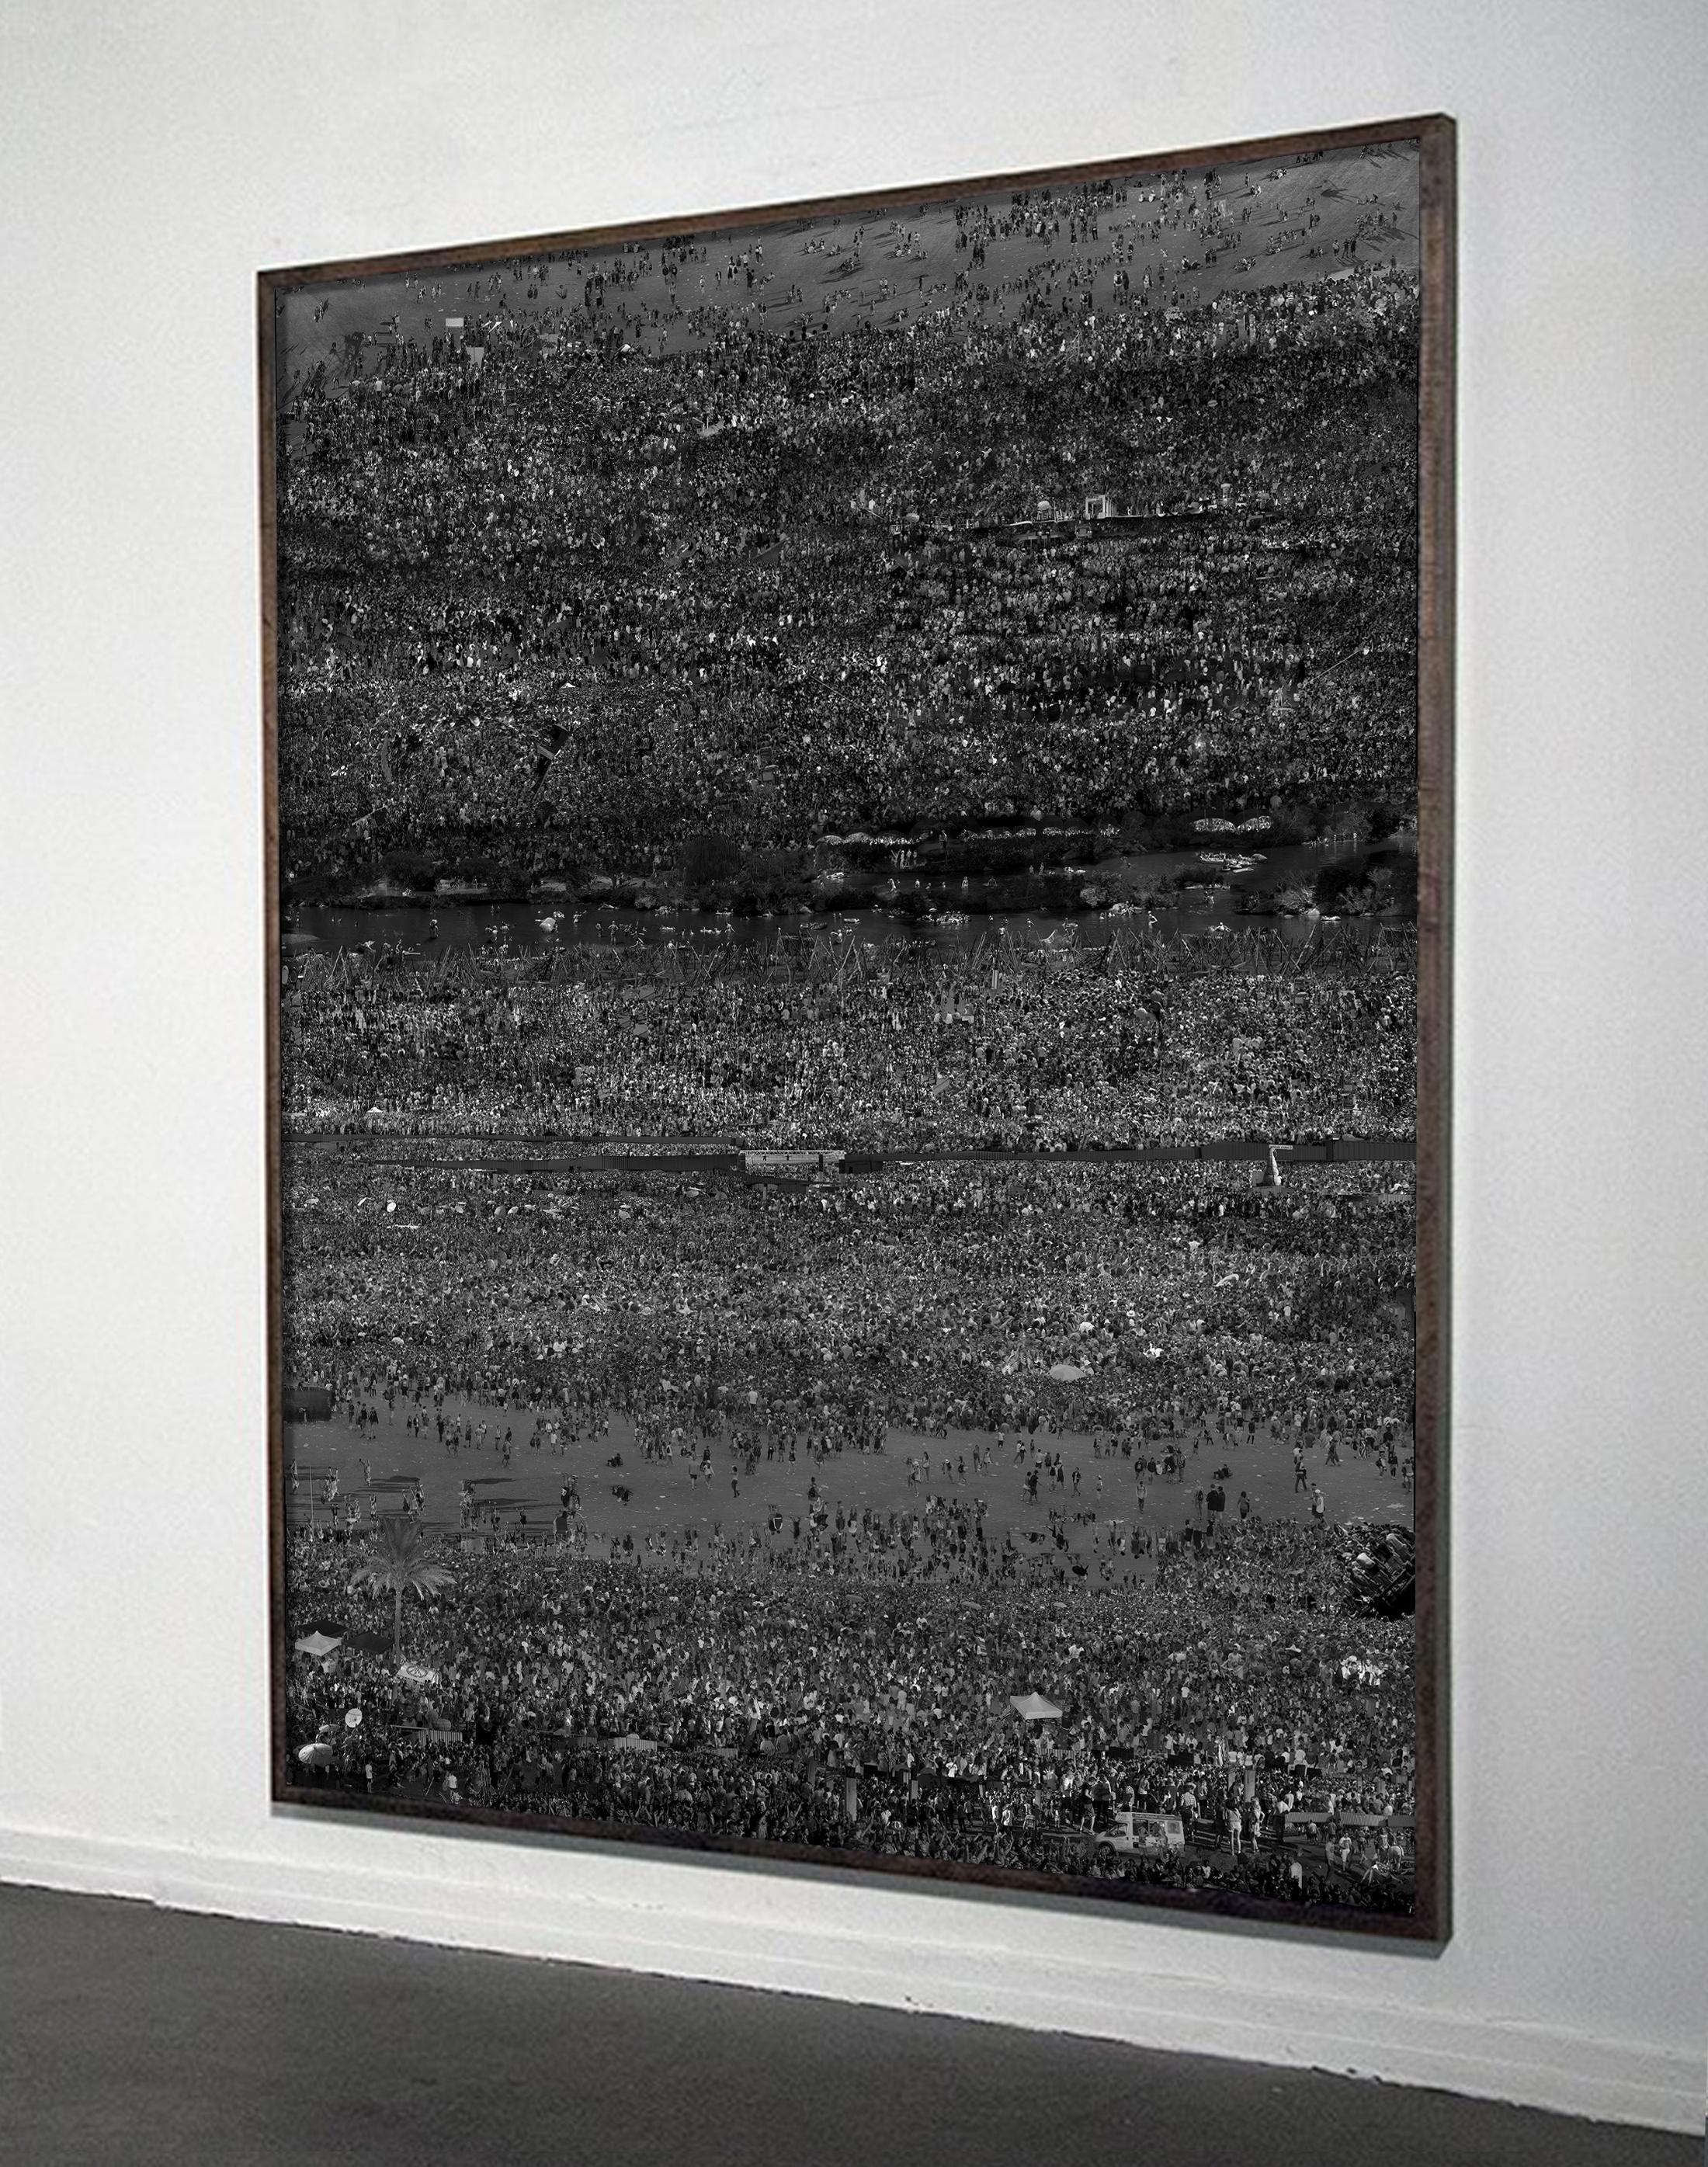 Untitled (Portugal, Rumania, London, ) Digital C Print. 71X100 inches